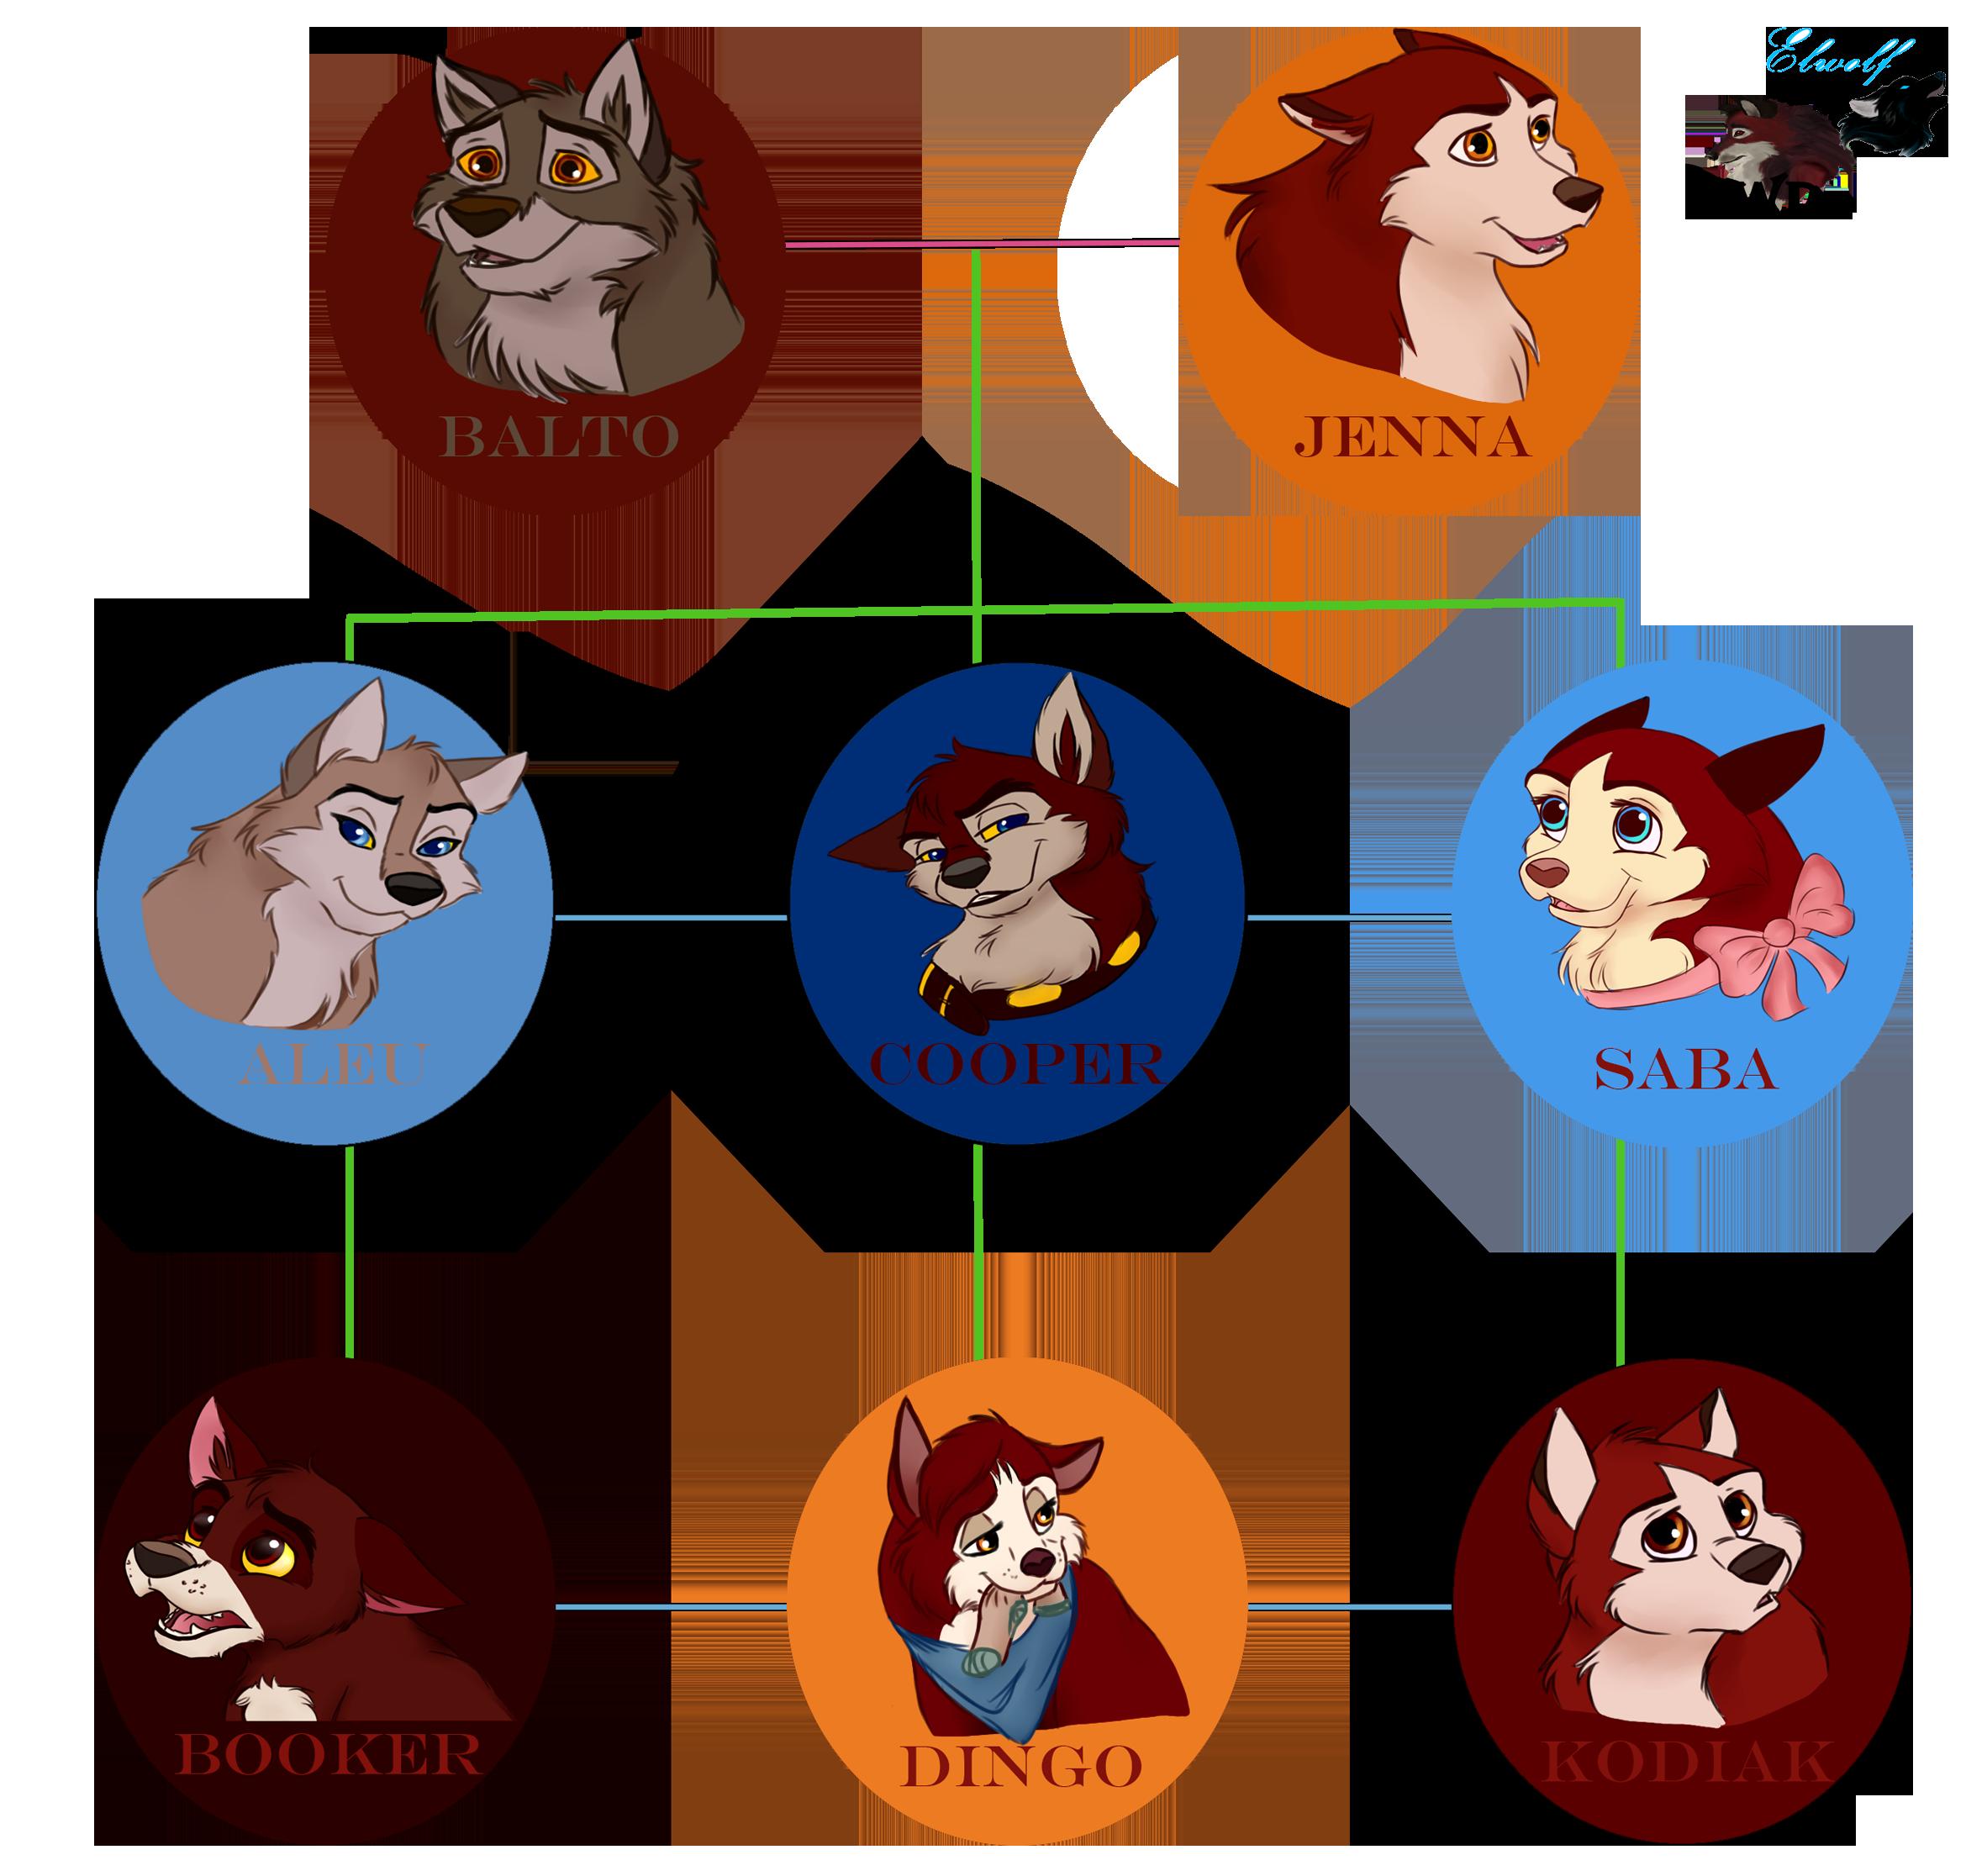 Balto S Family Tree By Buck Wolfdog On Deviantart